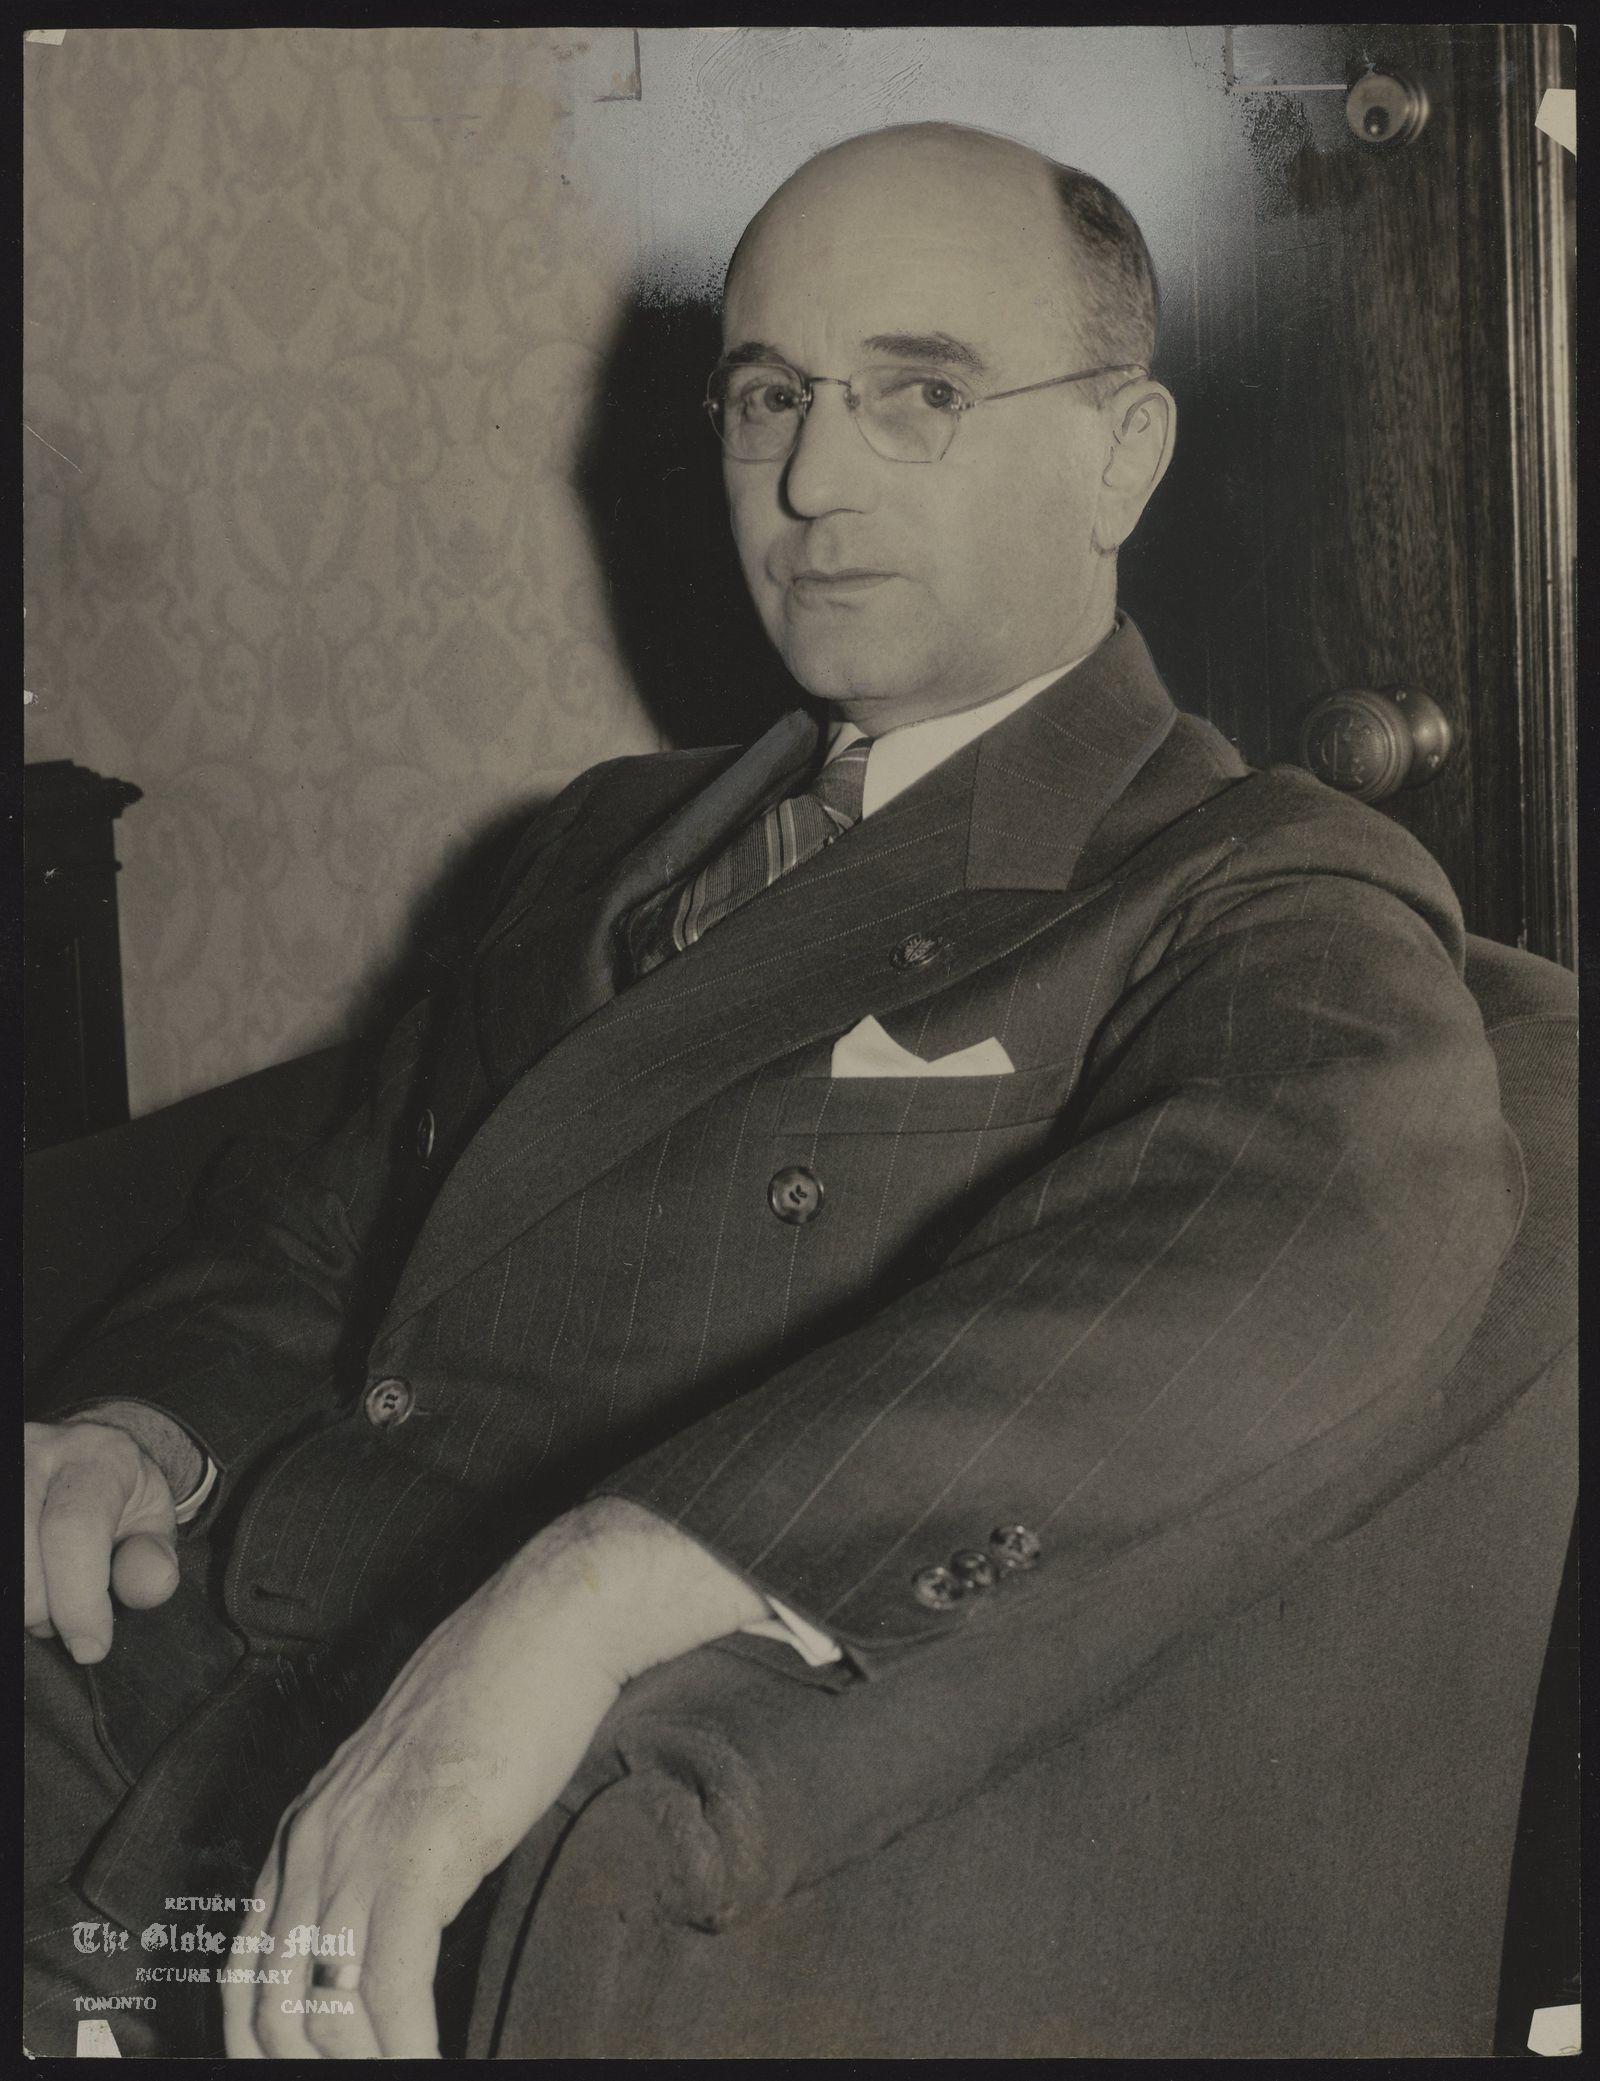 Premier J B (John) McNair of New Brunswick